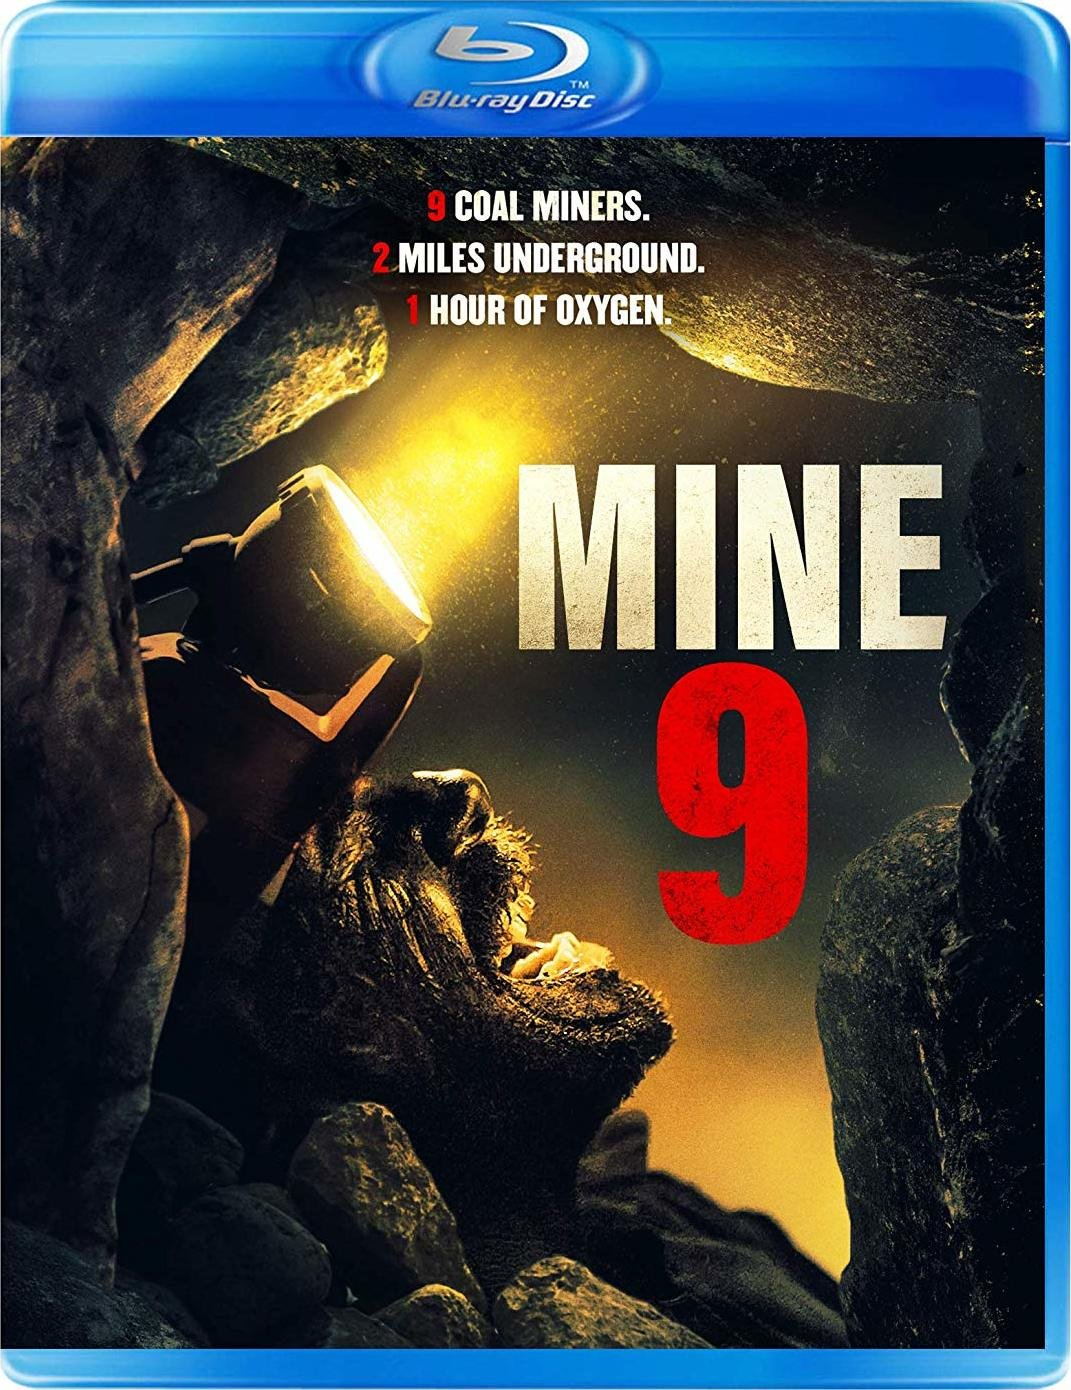 Mine 9 (2019) poster image